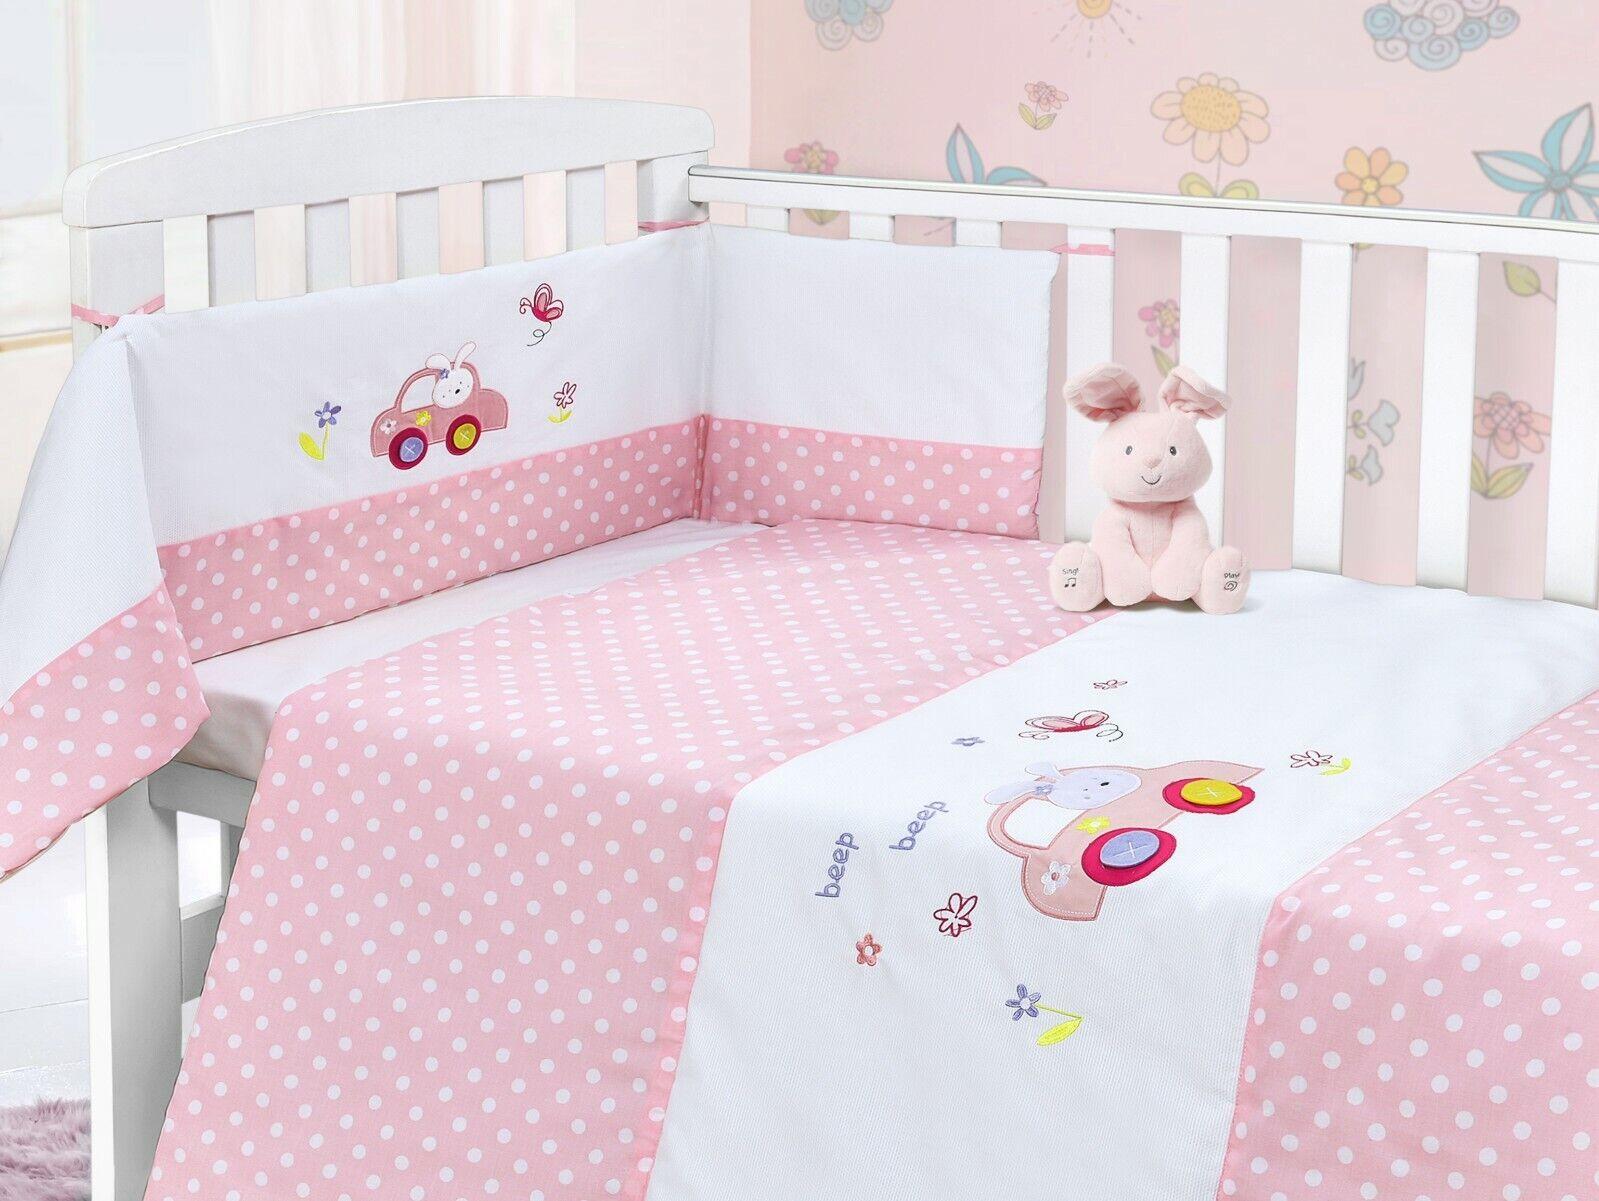 Baby Nursery Cot 2Pc Quilt /& Bumper Bedding Bale Set Blue Rocket